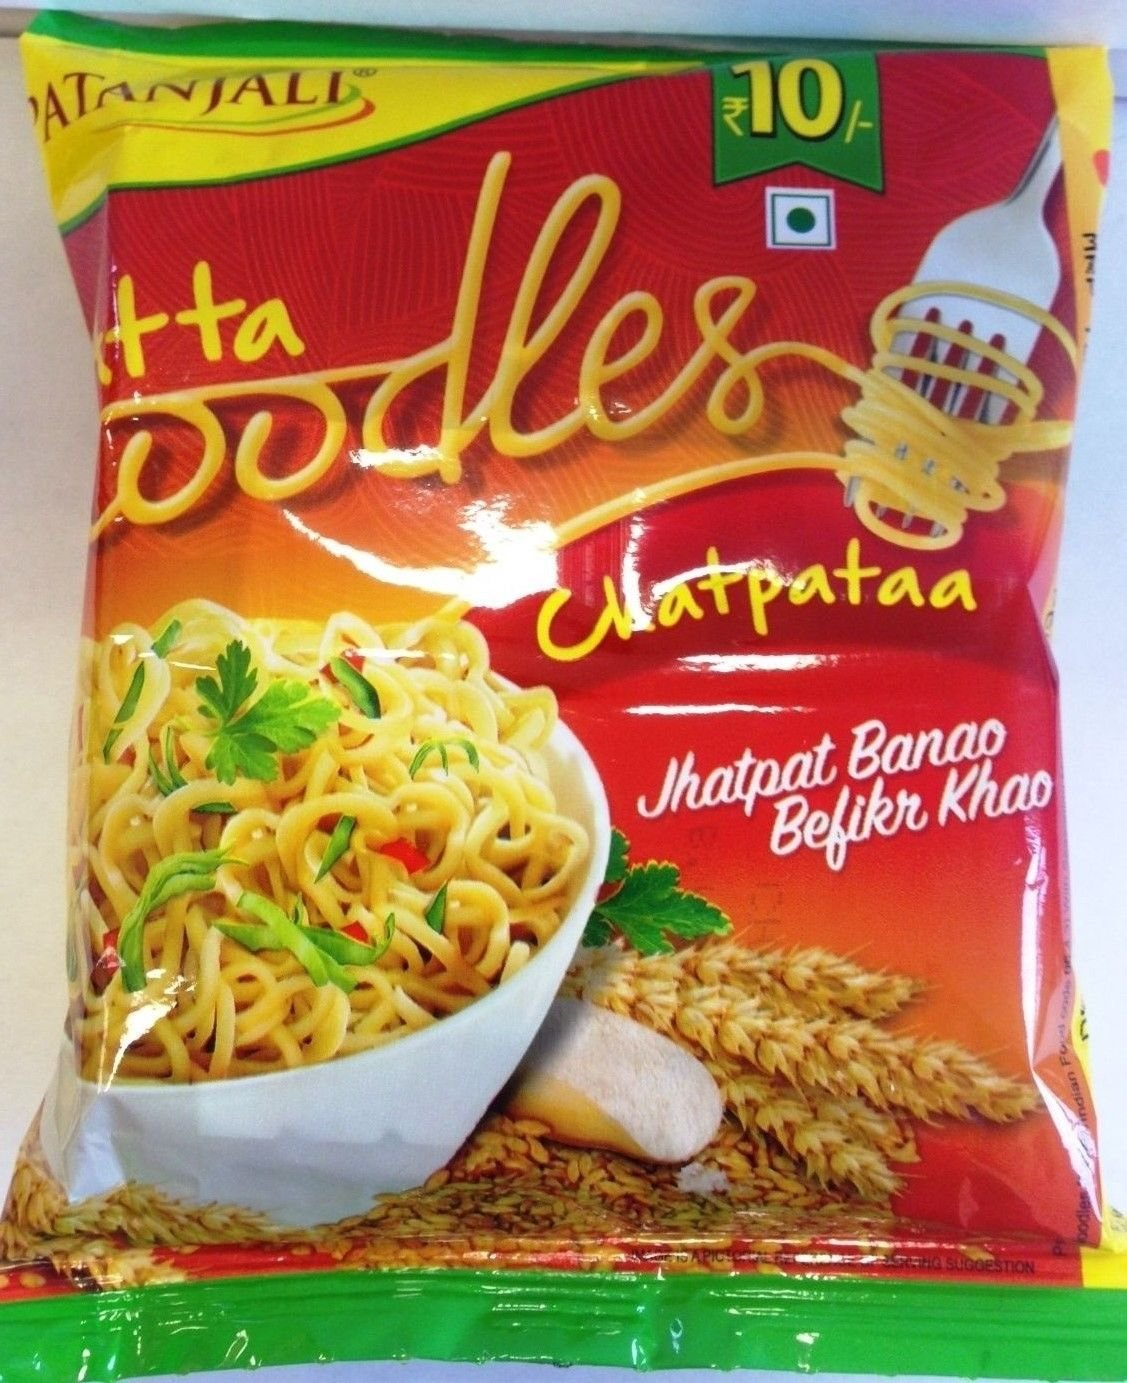 Patanjali Chatpata Atta(Wheat Flour) Noodles, 60g X 12 (720gms) by Patanjali